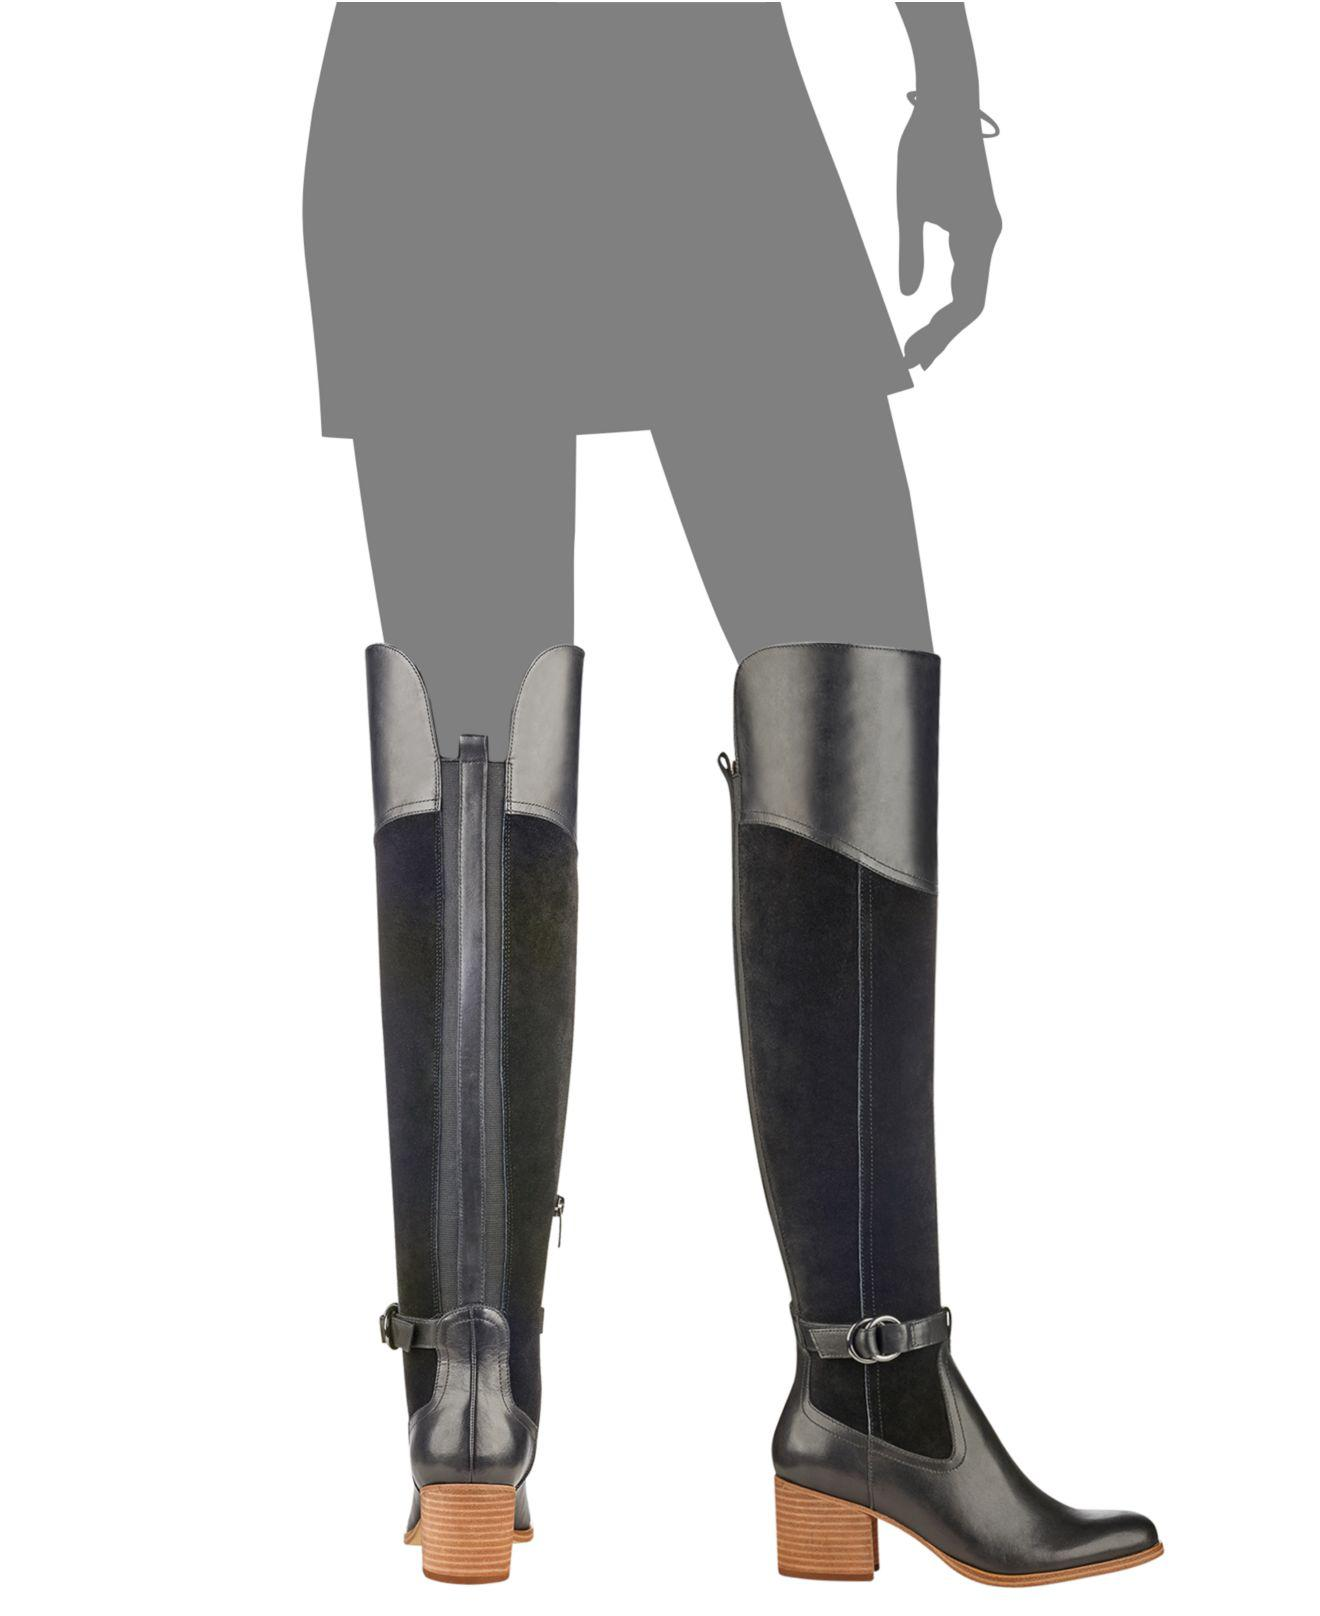 ffecf6be8121 Lyst - Marc Fisher Eisa Over-the-knee Block-heel Boots in Black